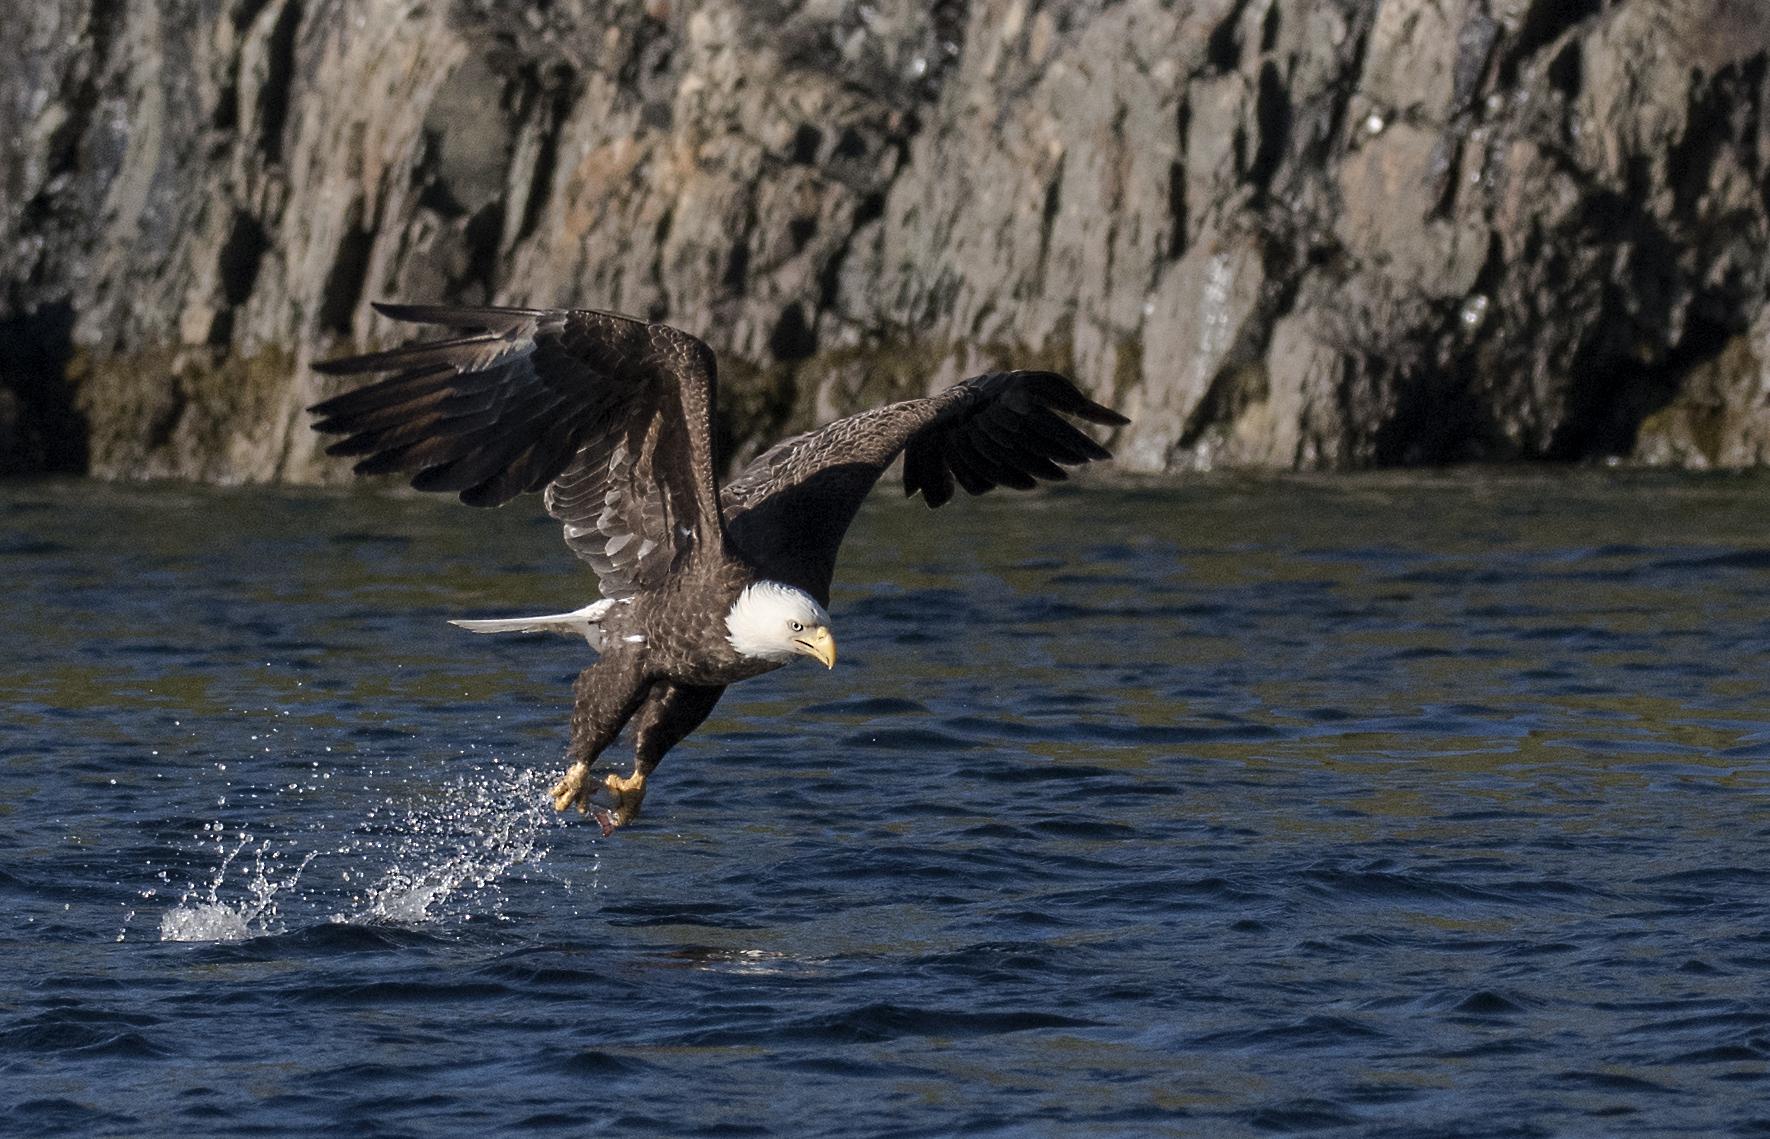 trinity newfoundland bald eagle.jpg